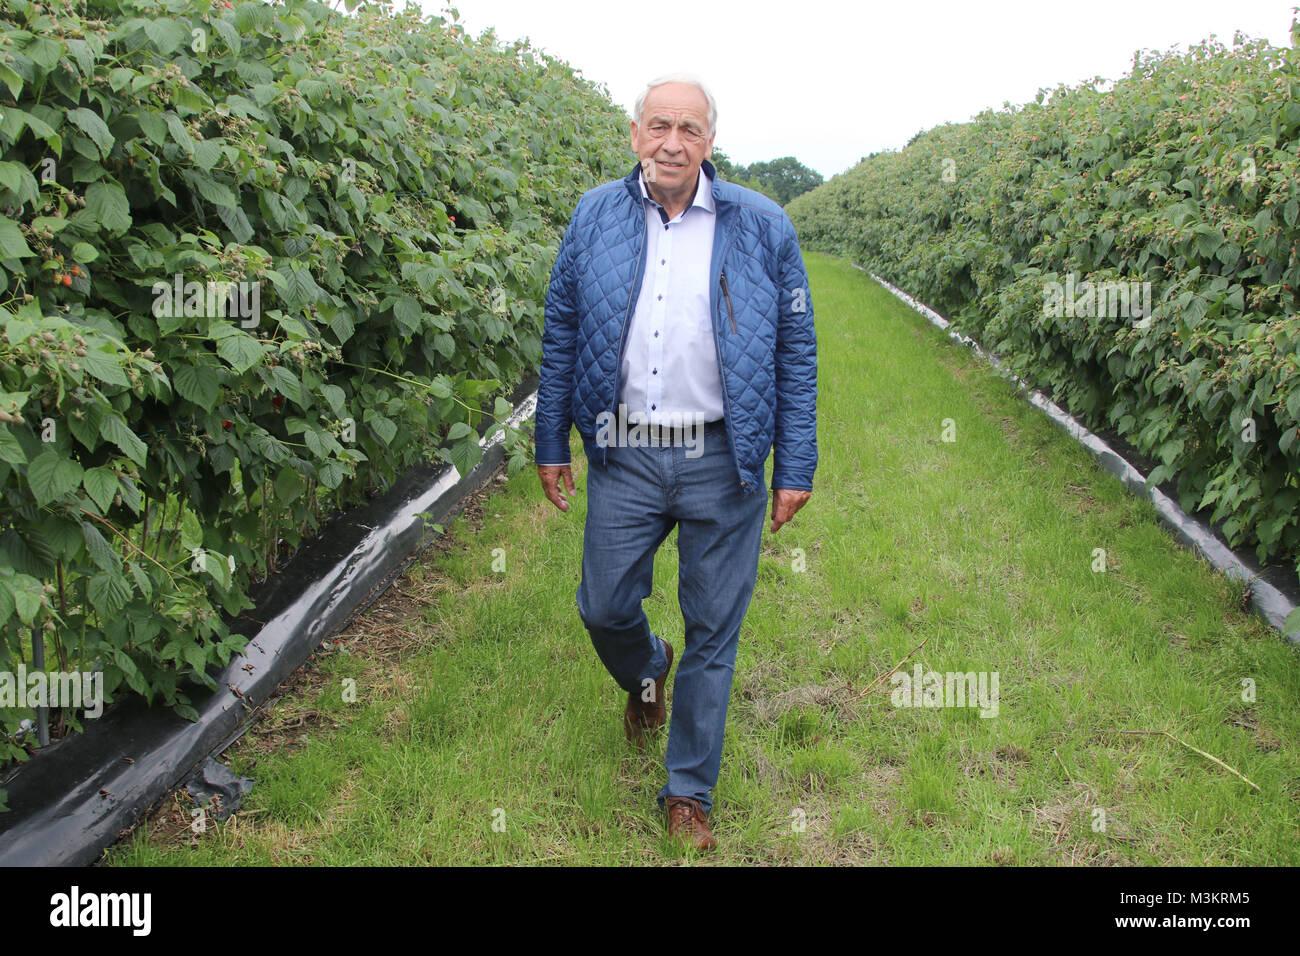 Enno Glantz, Start der Himbeer-Saison, Erdbeerhof Glantz, Hamburger Str. 2a, 22941 Delingsdorf, 27.06.2016 - Stock Image